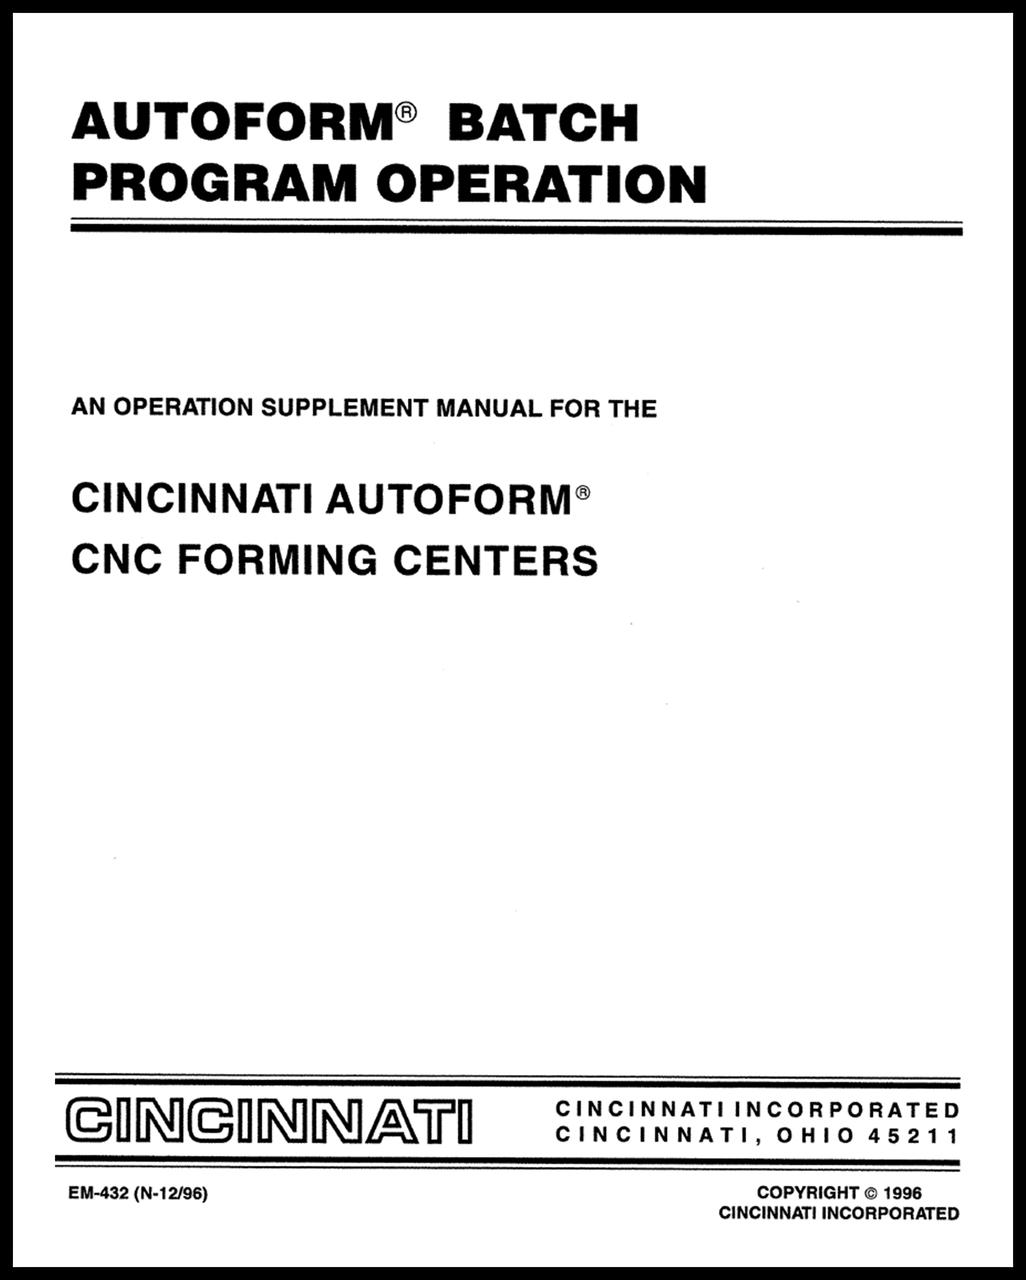 EM-432 (N-12-96) Autoform Batch Program Operation